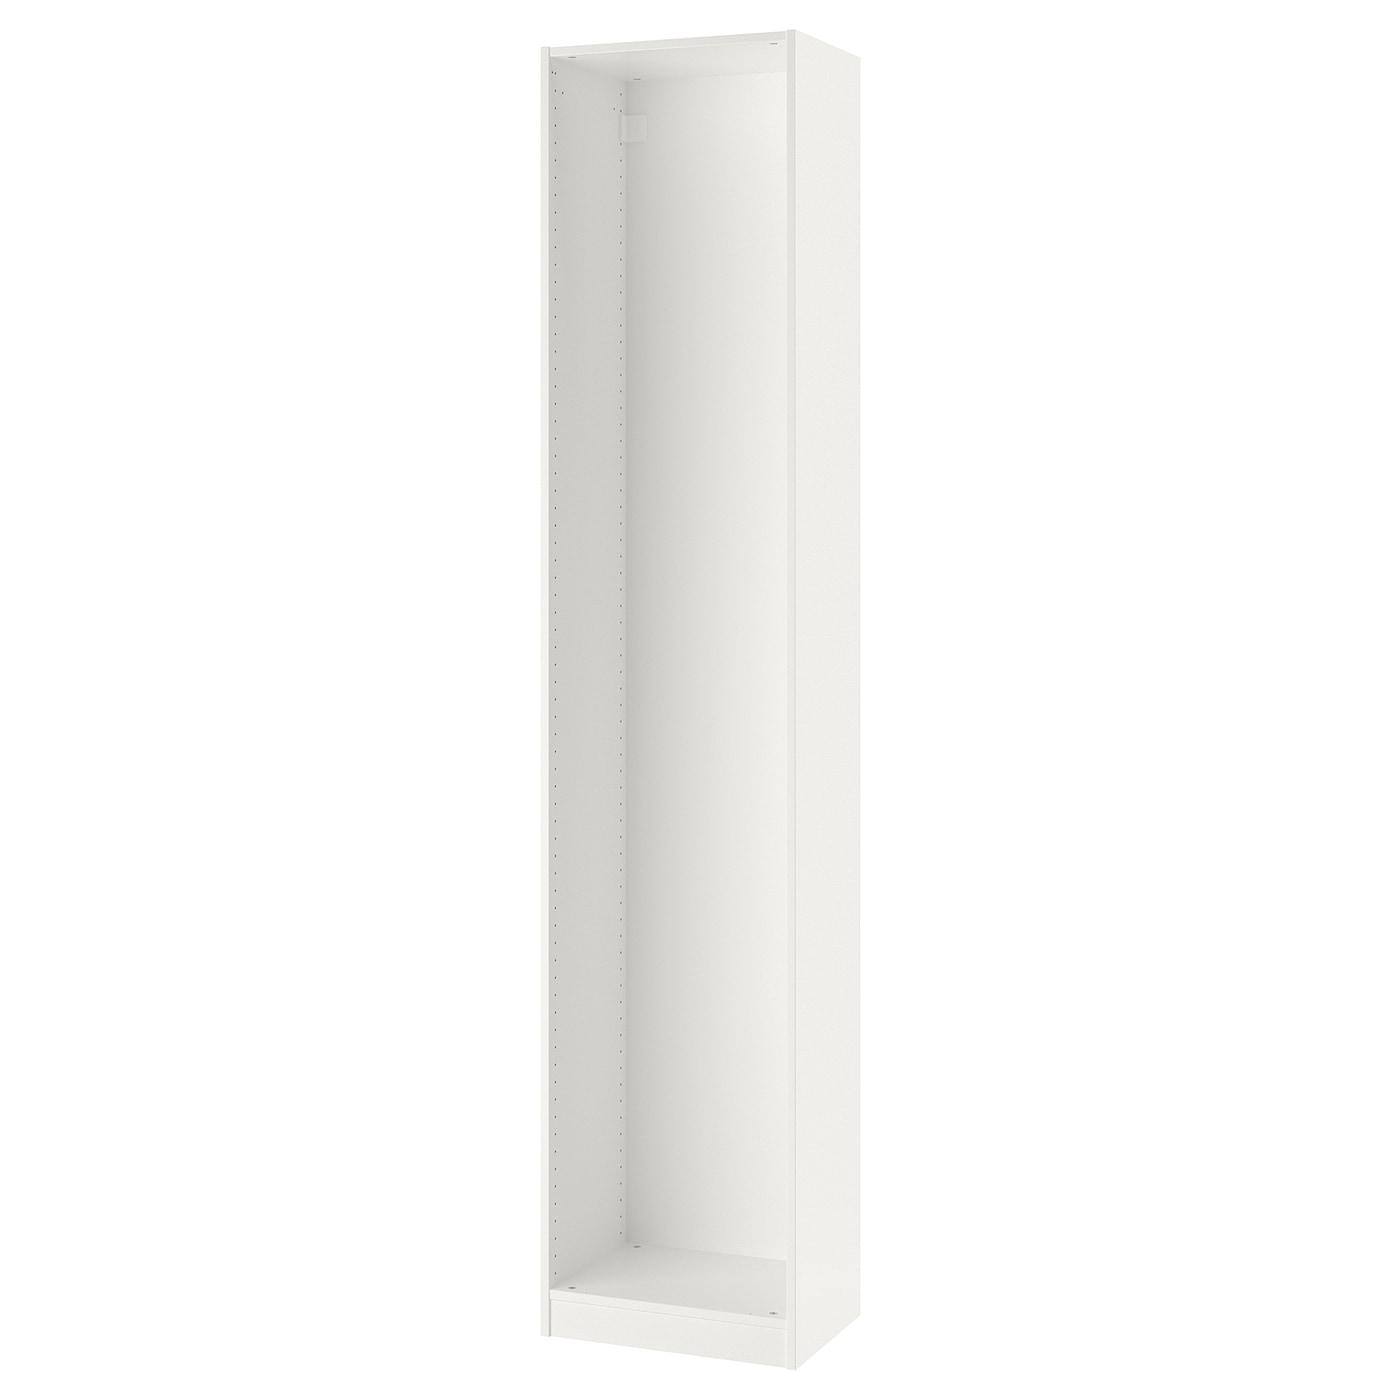 Betere PAX Basiselement kledingkast, wit, 50x35x236 cm - IKEA TK-68